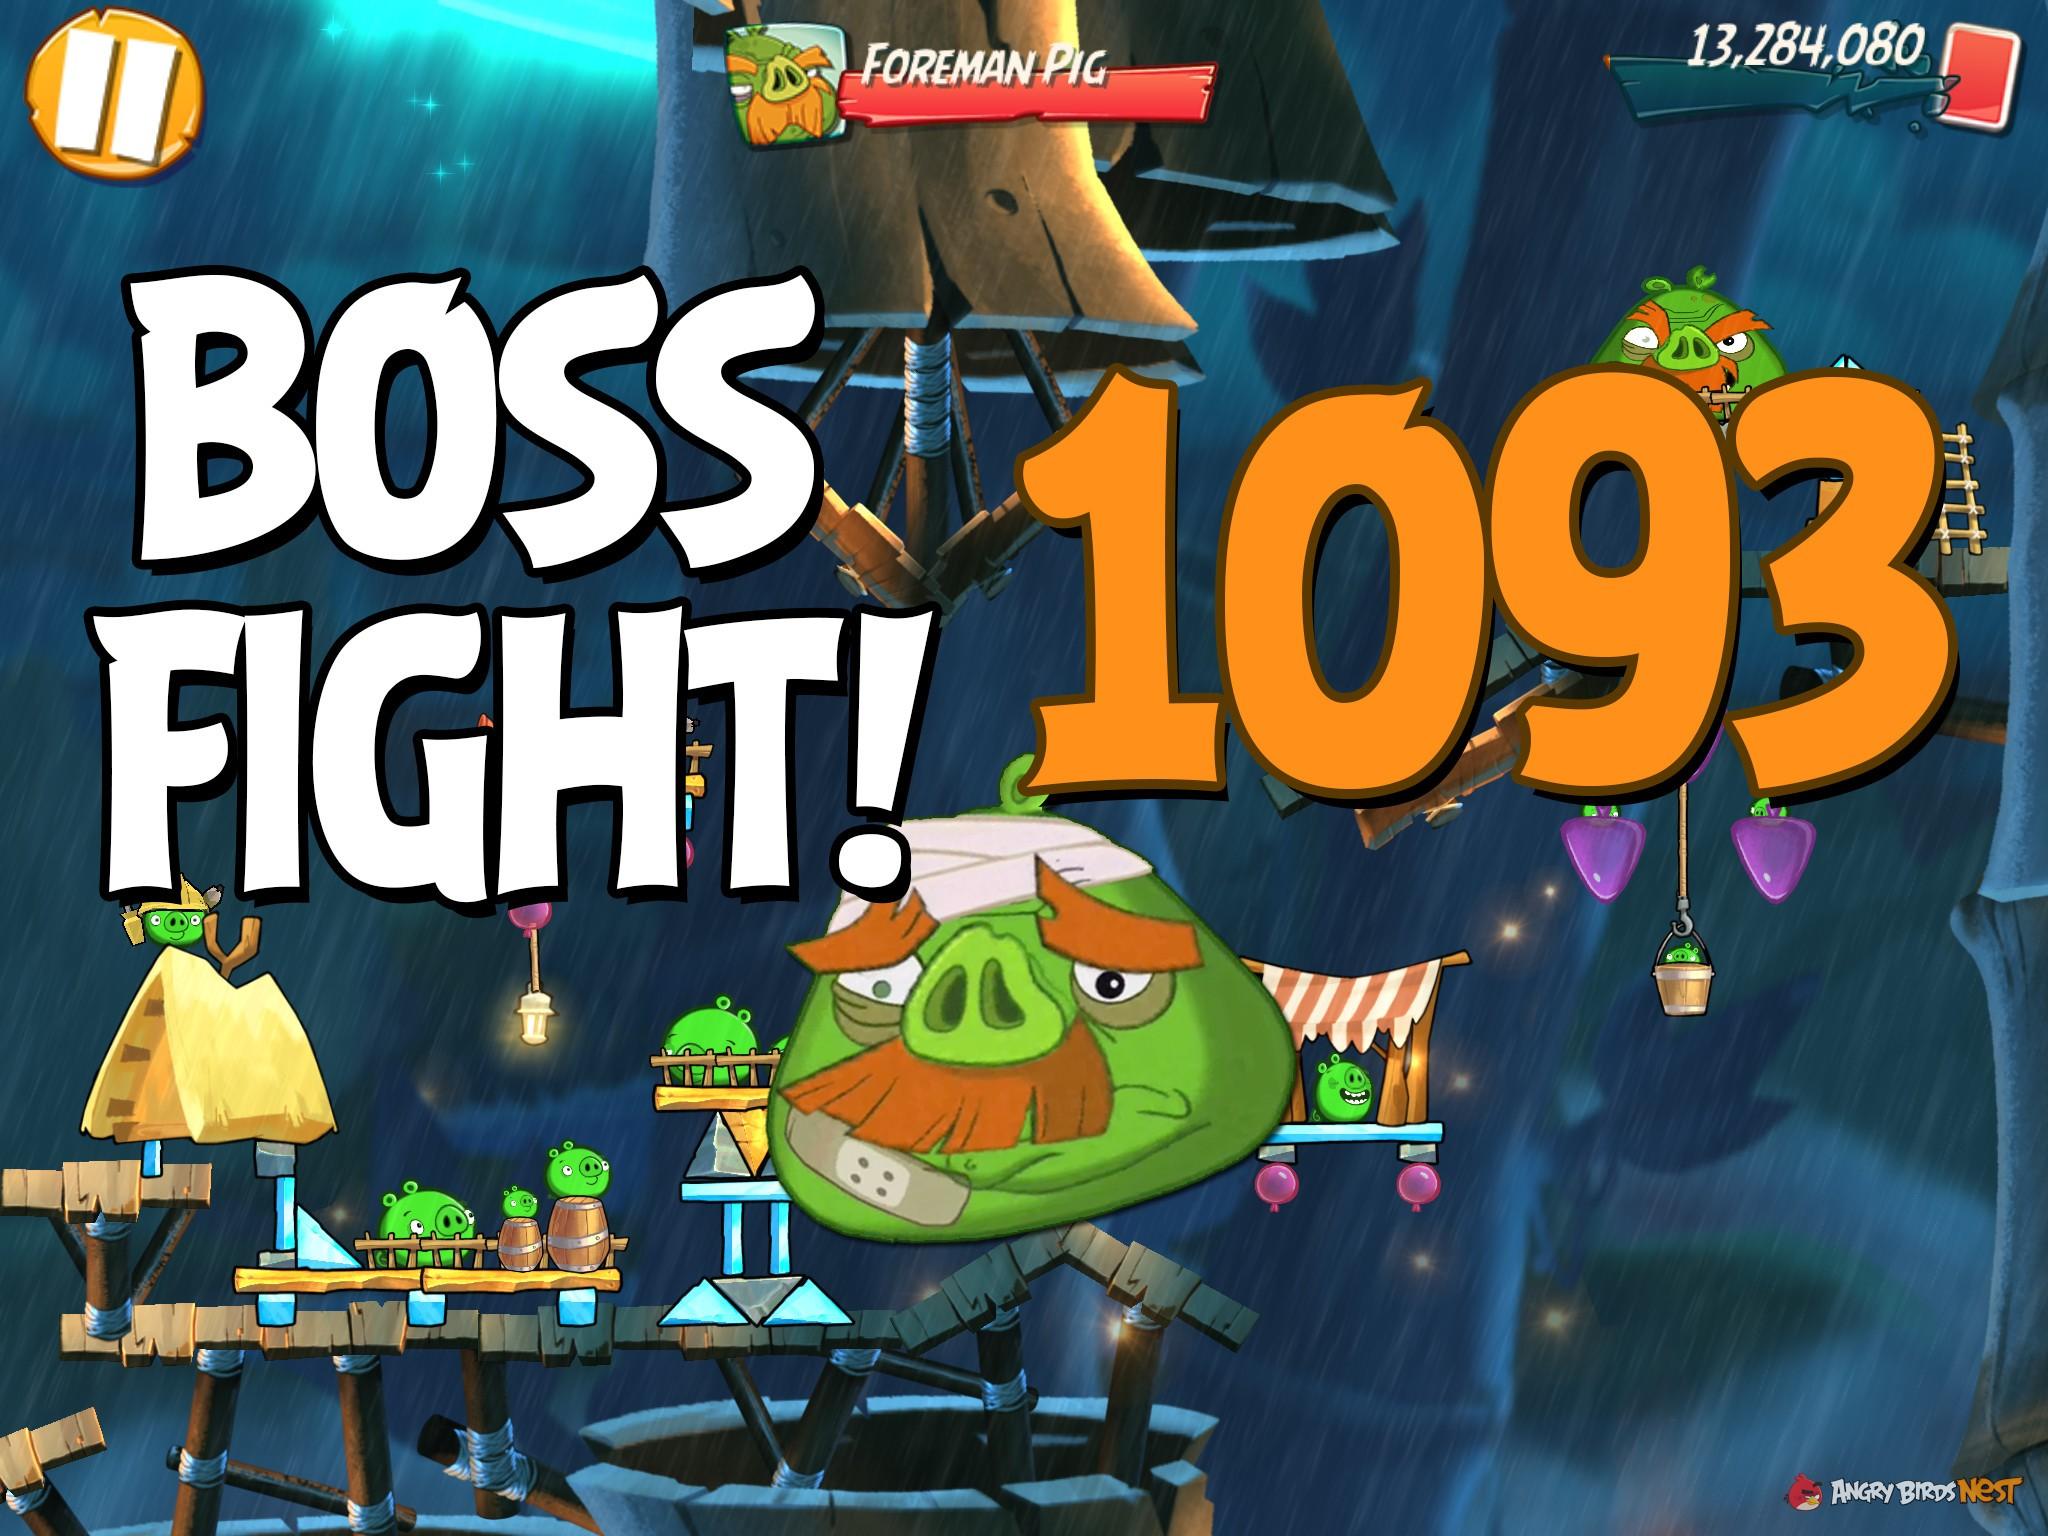 Angry Birds 2 Boss Fight Level 1093 Walkthrough – Bamboo Forest Boarneo    AngryBirdsNest